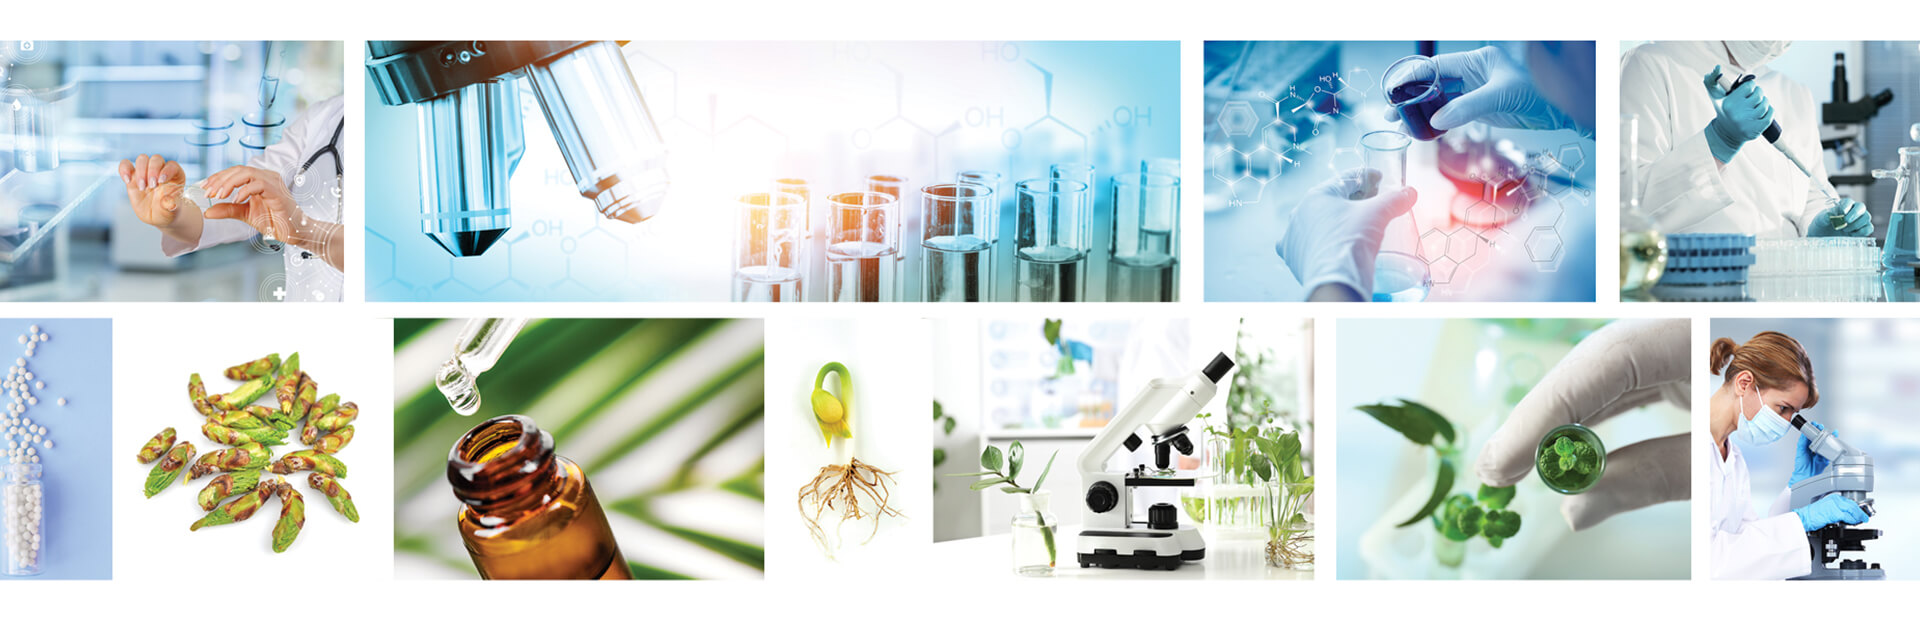 Laboratoarele Plantextrakt - Tehnologii